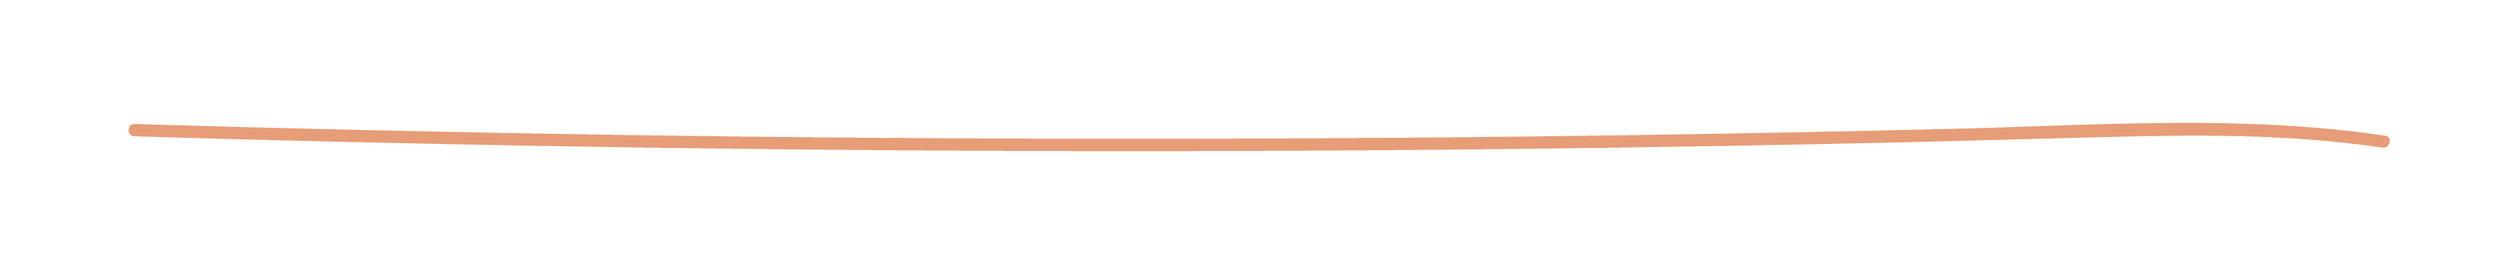 Line 2.jpg